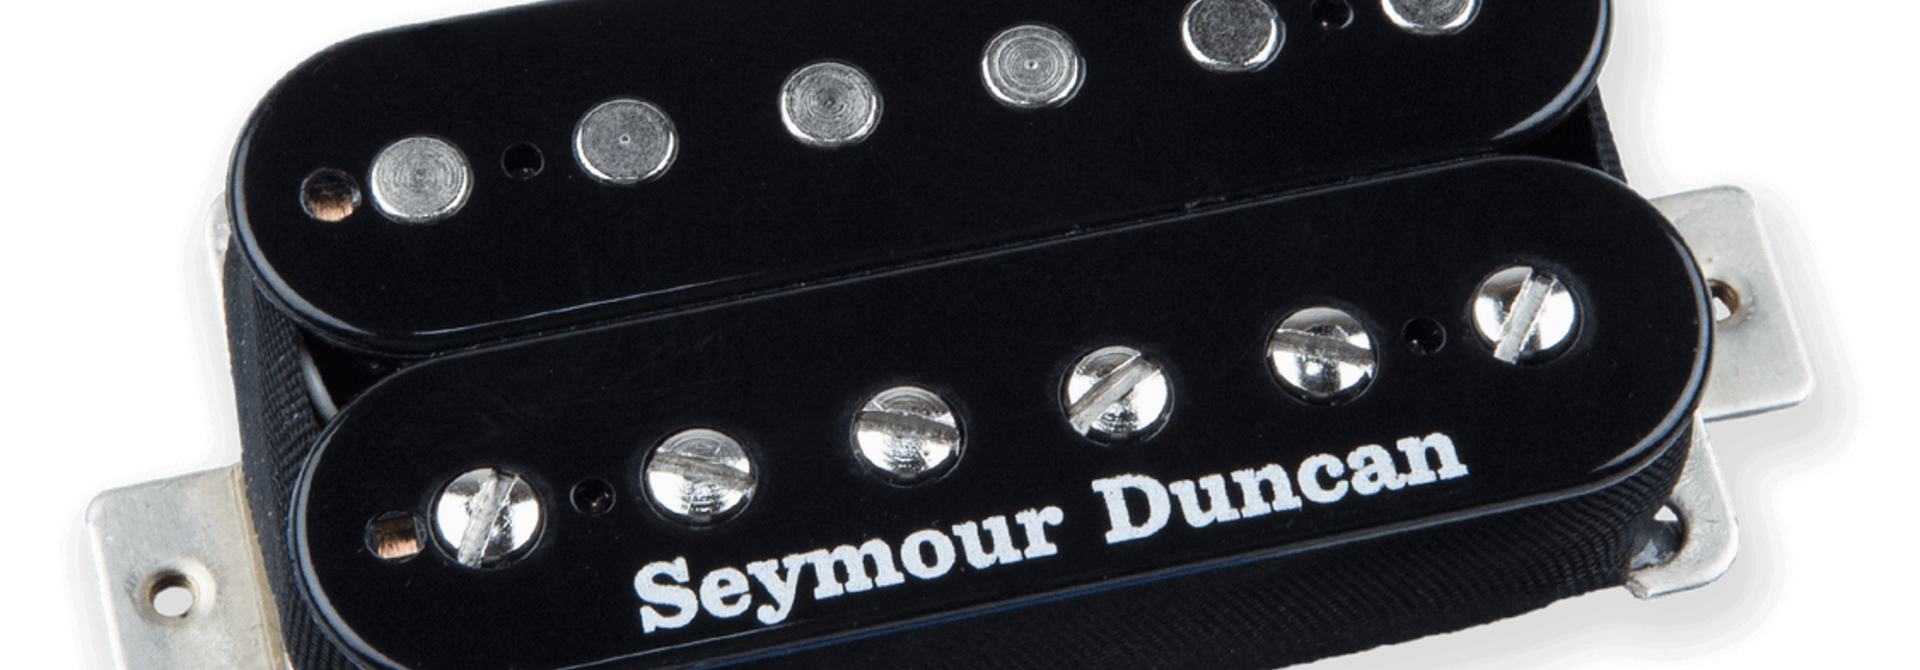 Seymour Duncan Jazz Model Humbucker SH-2n